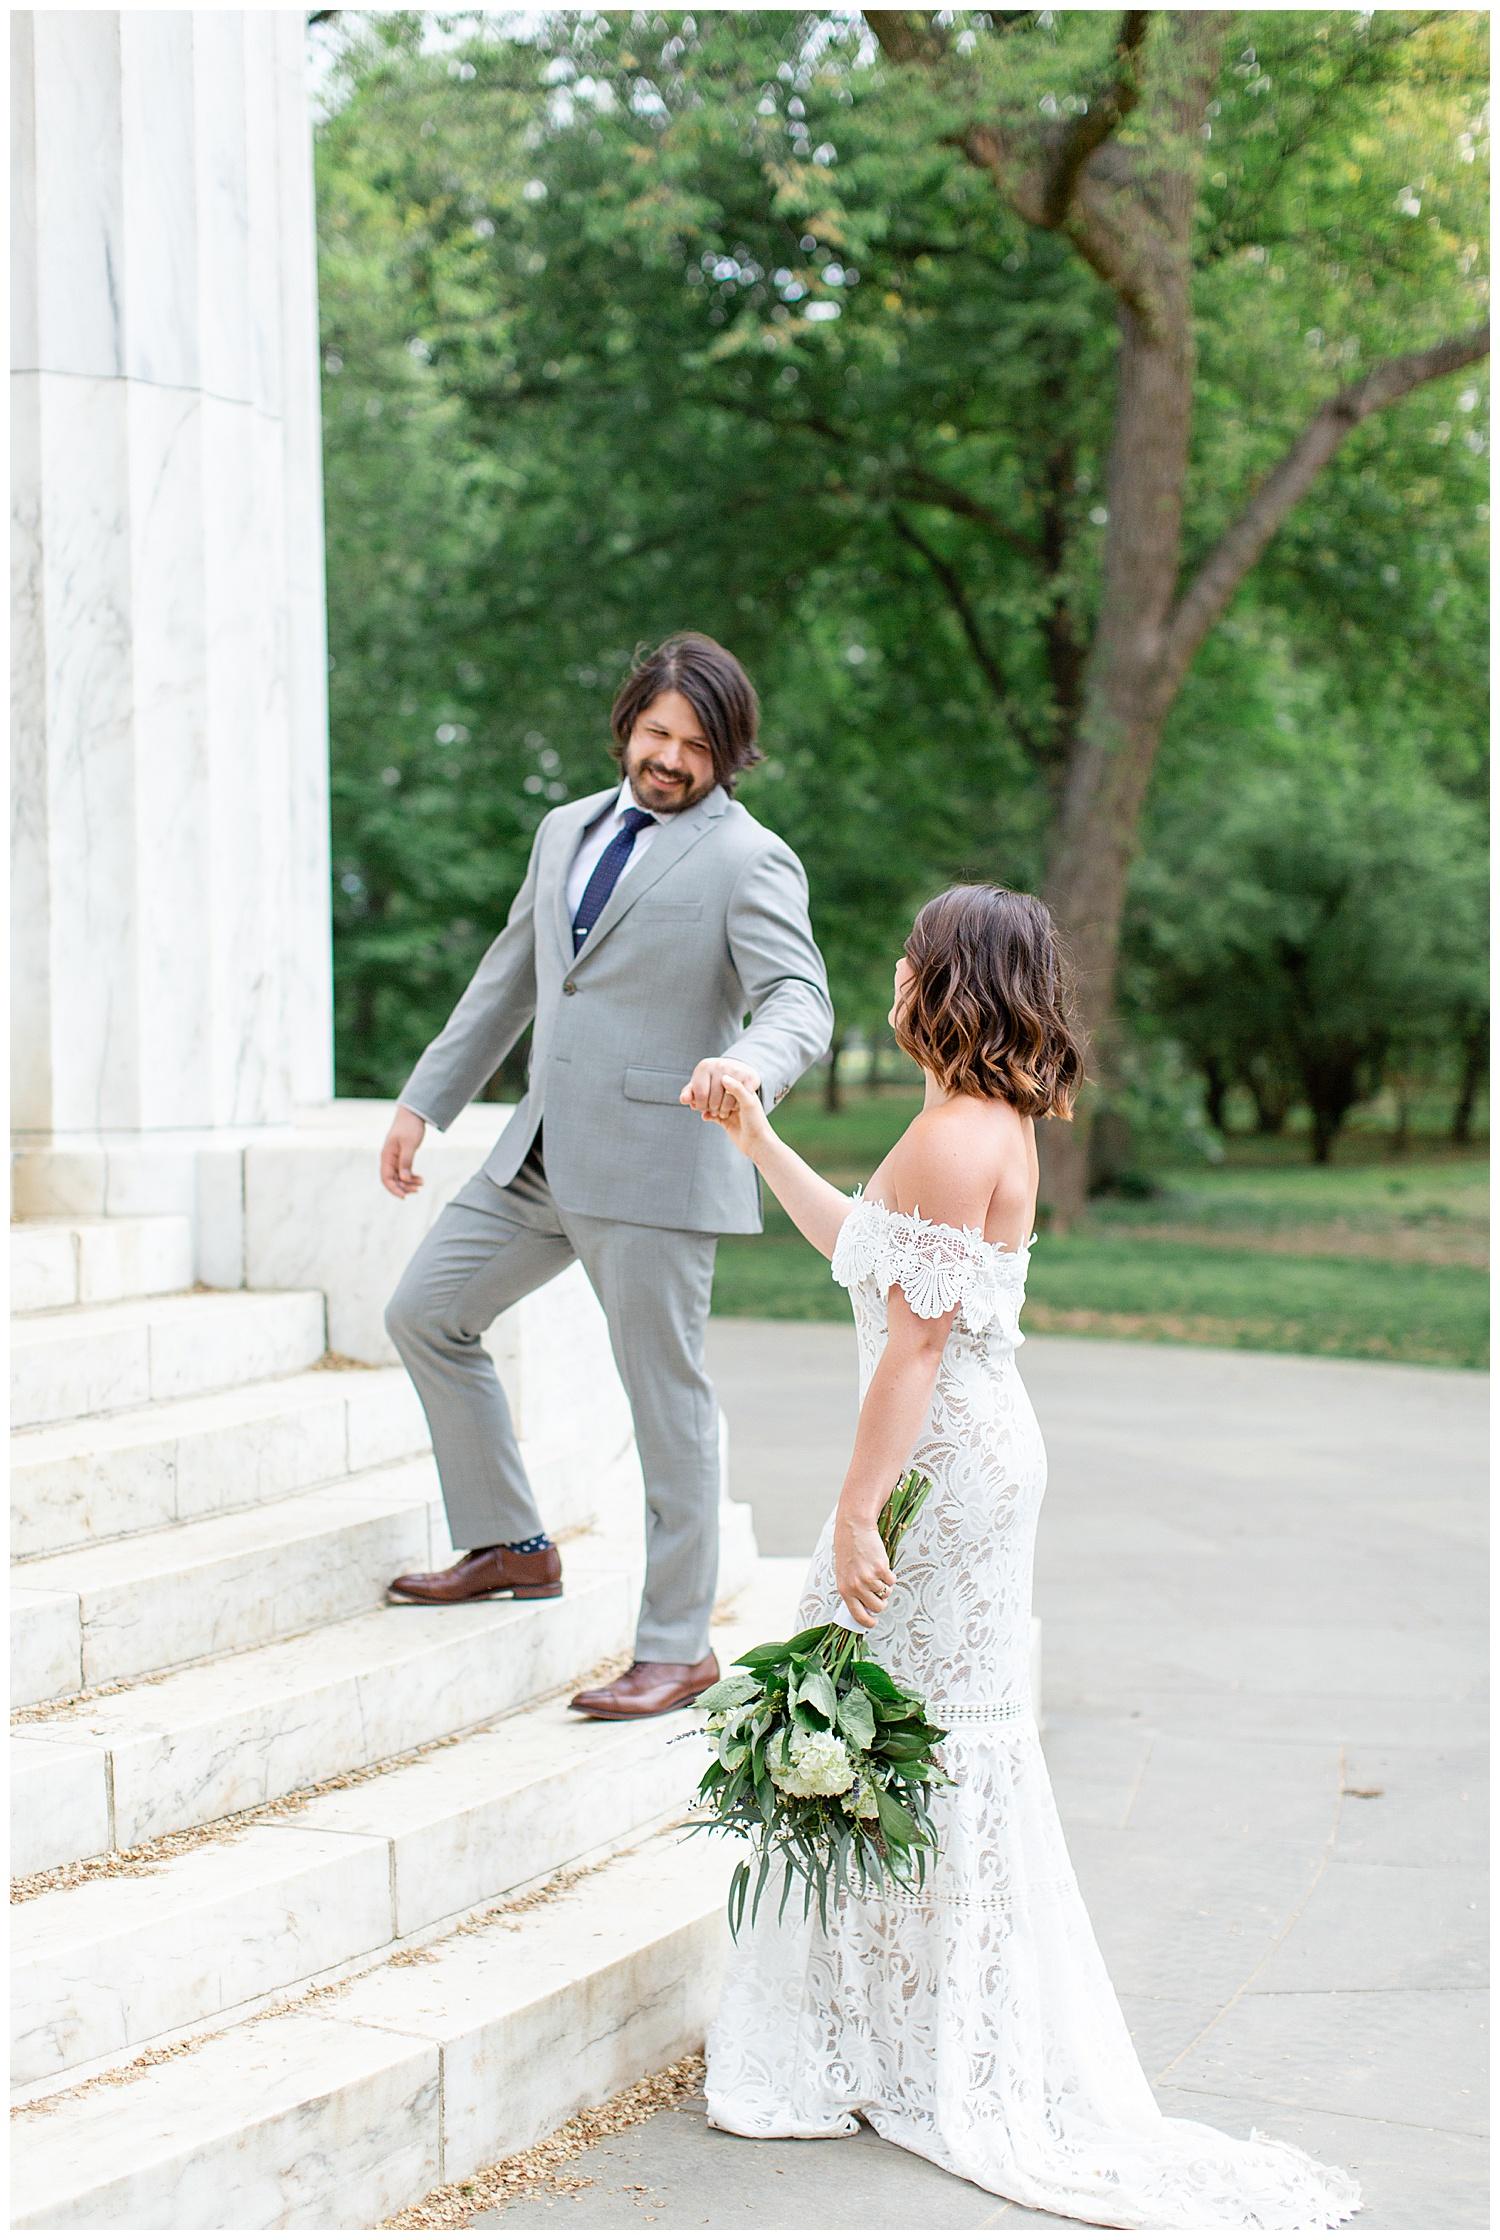 emily-belson-photography-washington-dc-wedding-28.jpg